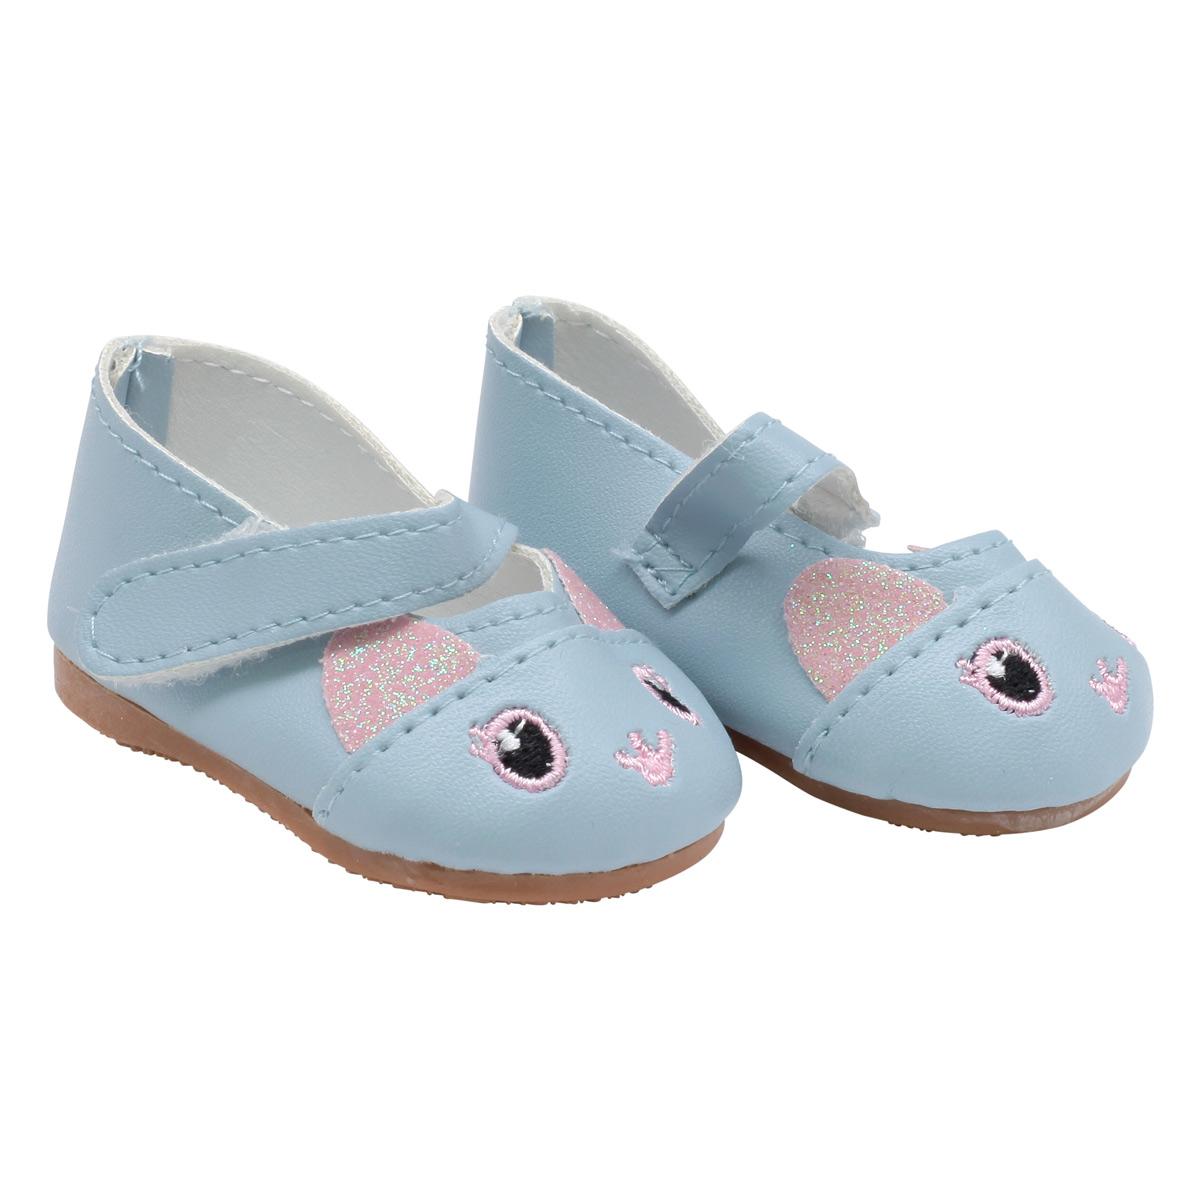 MISU-16 Сандали для куклы 'Котята', 7см, цв. голубой